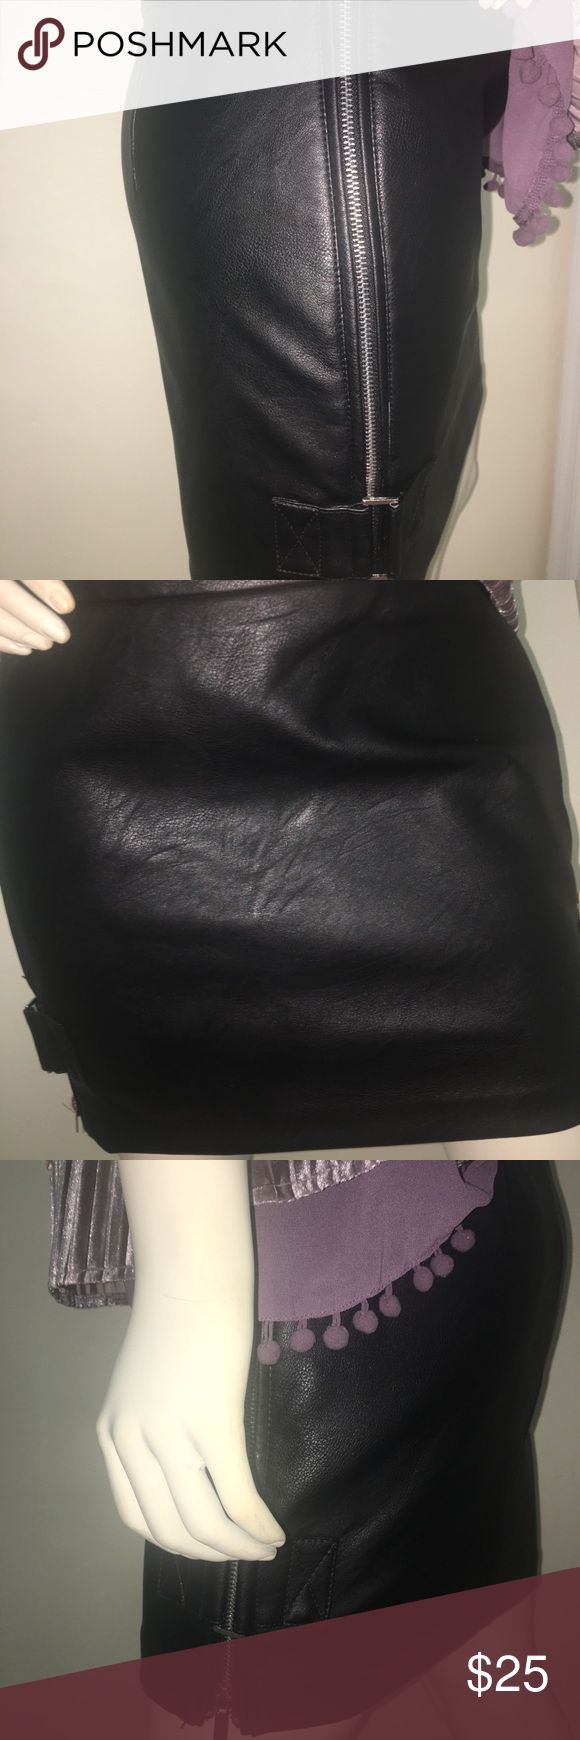 Short skirt -artificial leather, Short skirt -artificial leather, Reserved Skirts Mini